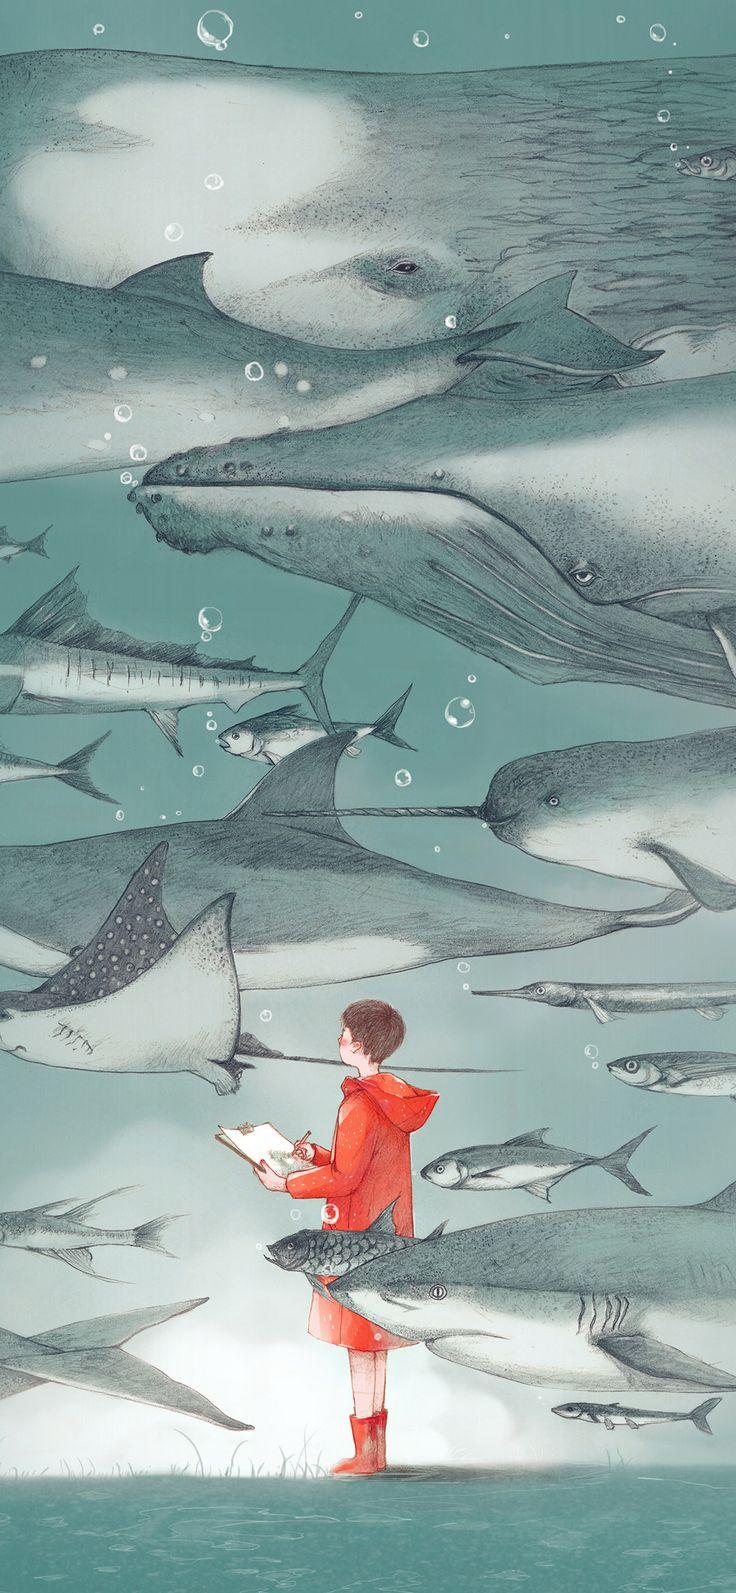 Iphone X Wallpaper Ba54 Water Fish Pastel Animal Illustration Art